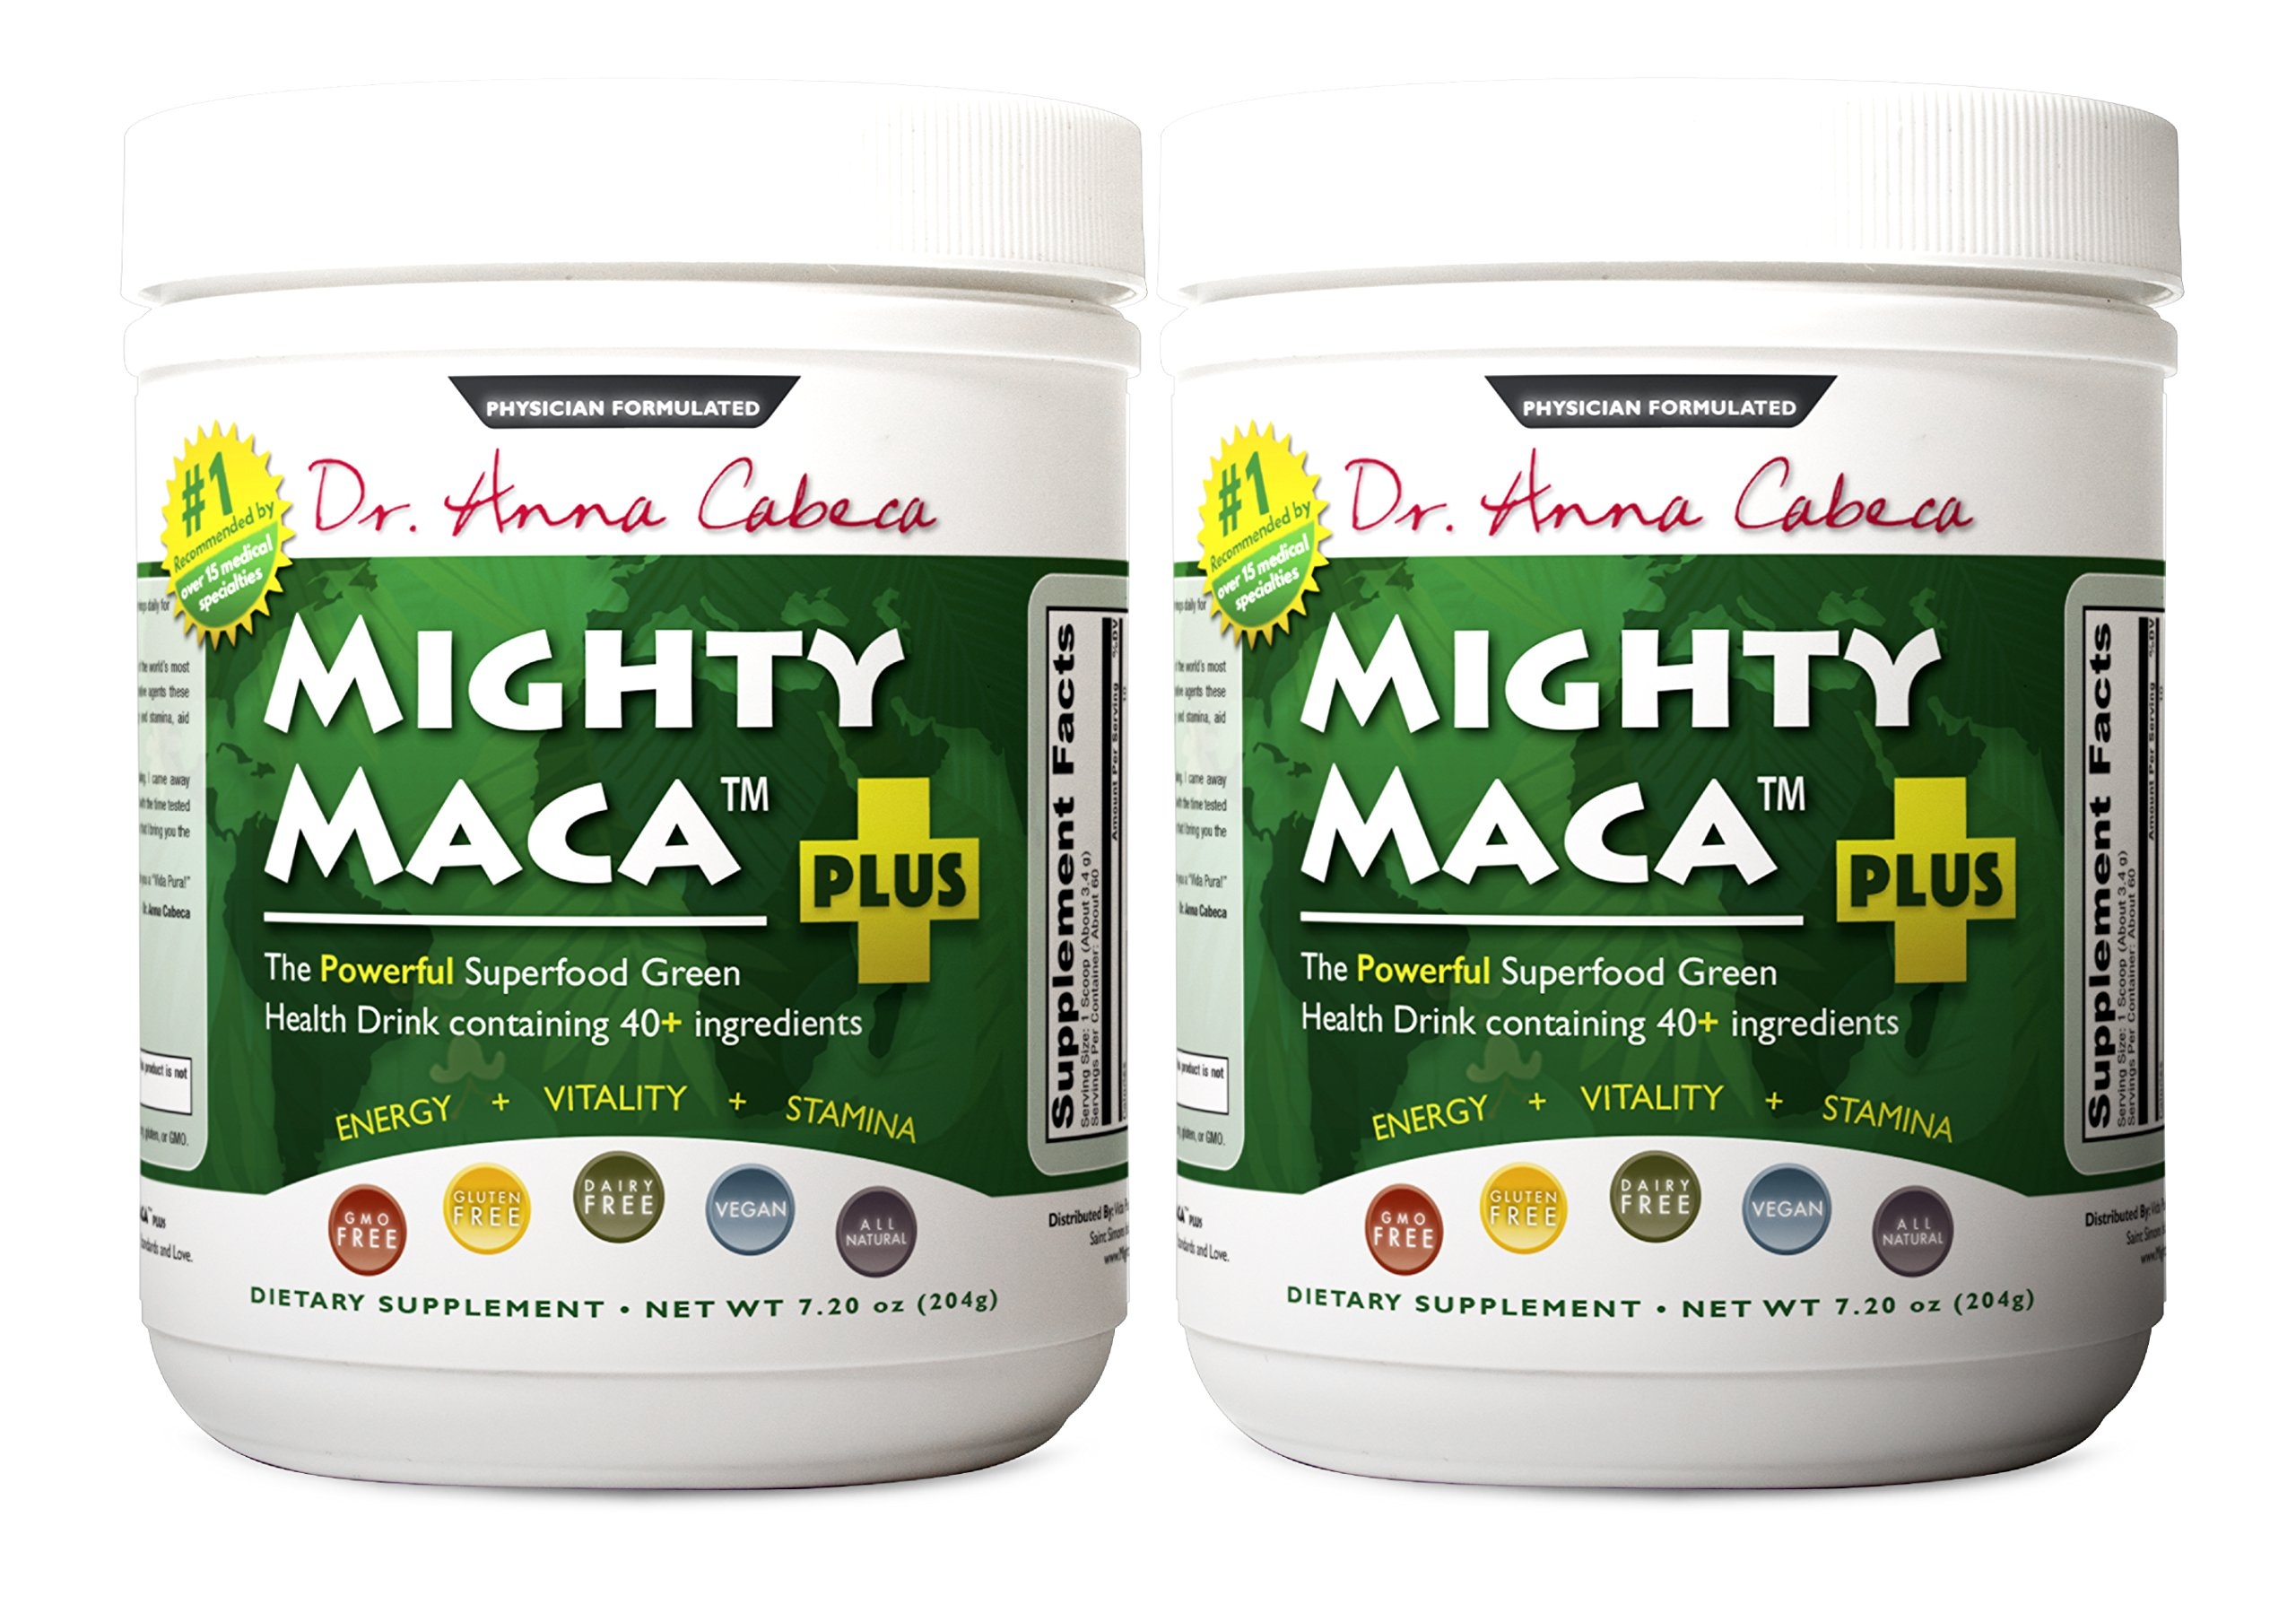 Mighty Maca Plus (2 Pack) - Delicious, All-Natural, Organic Maca Superfoods Greens Drink, Allergen & Gluten Free, Vegan, Powder by VidaPura